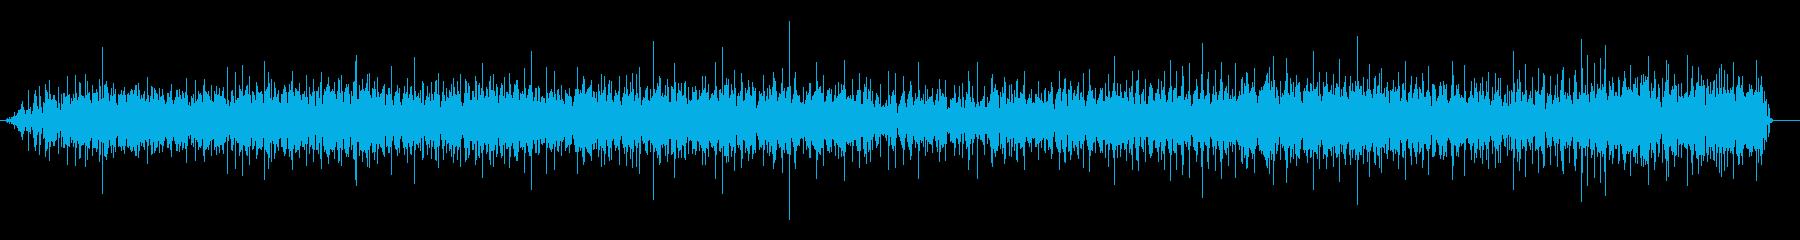 MANUAL:MIX IN BOW...の再生済みの波形